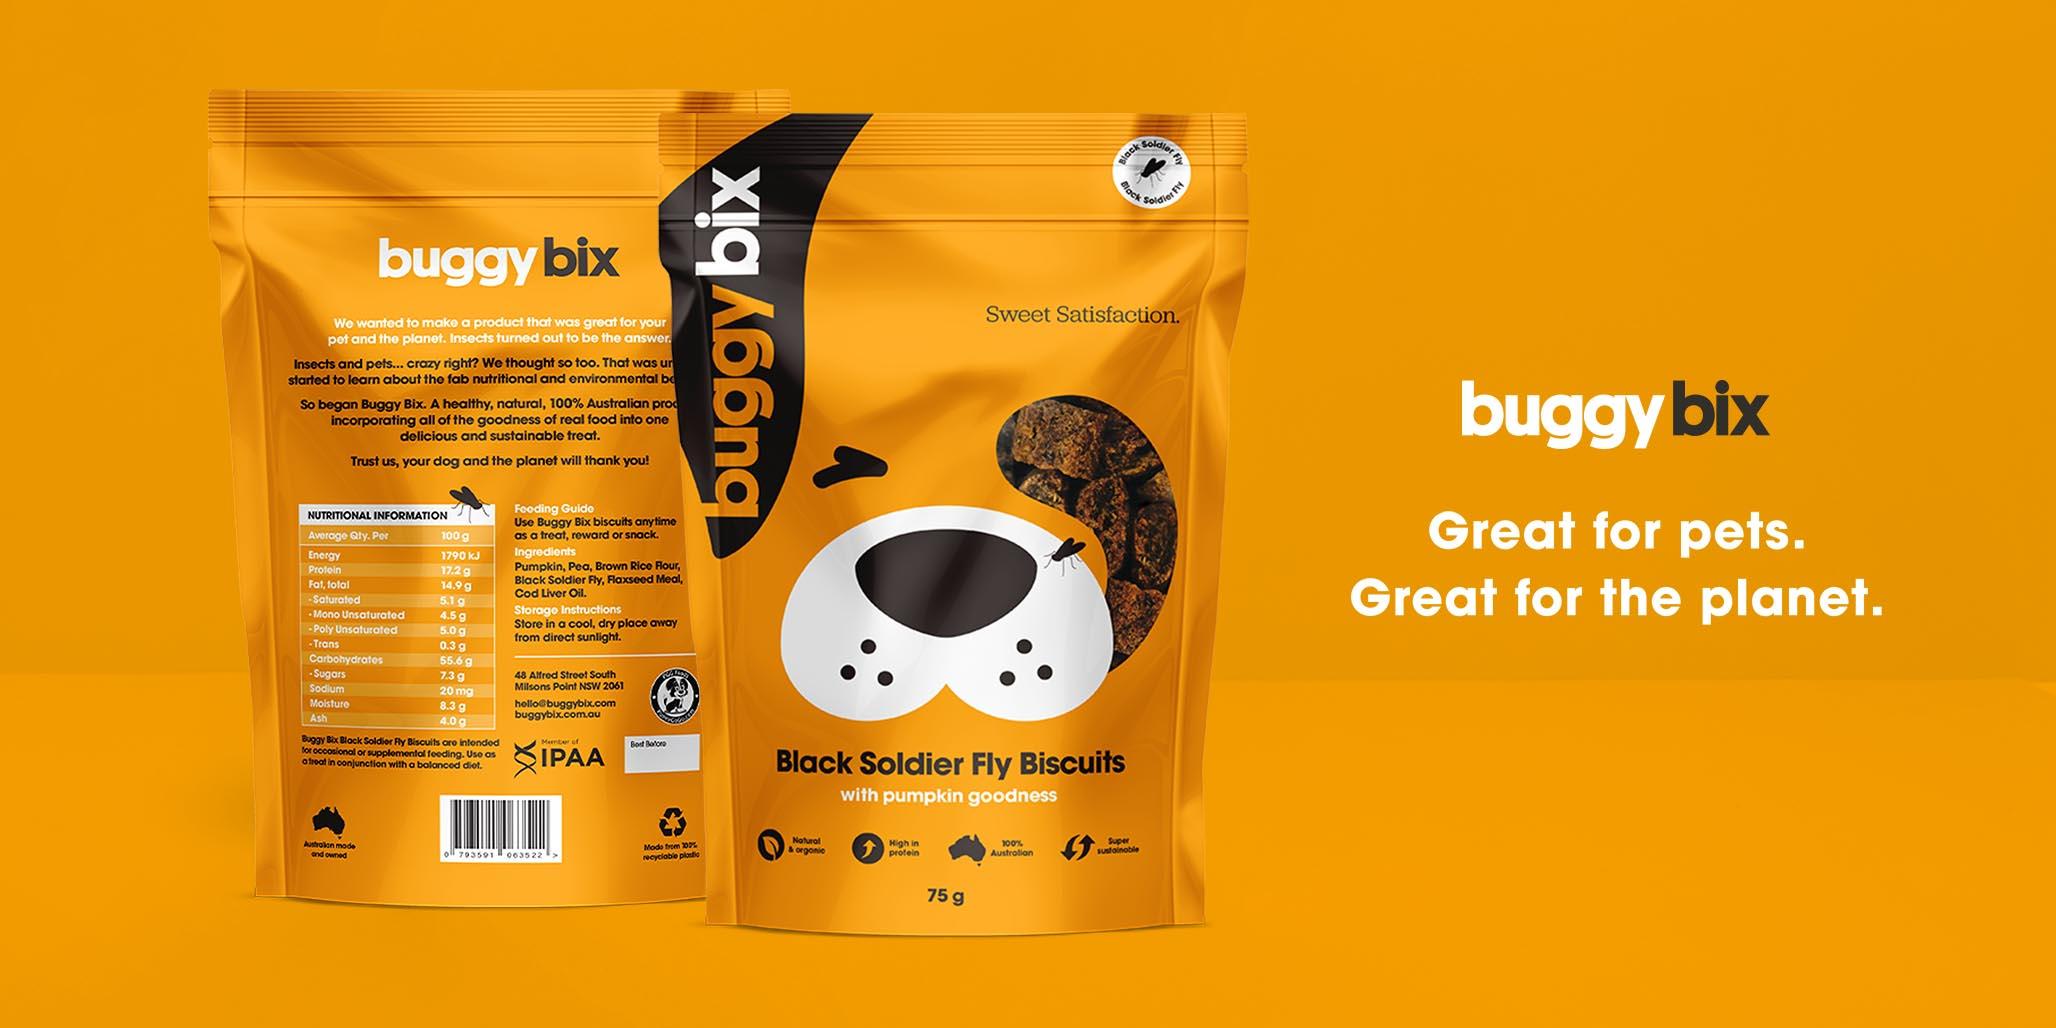 Website Design project image for pet food website design by Percept creative agencies Sydney, case study image H